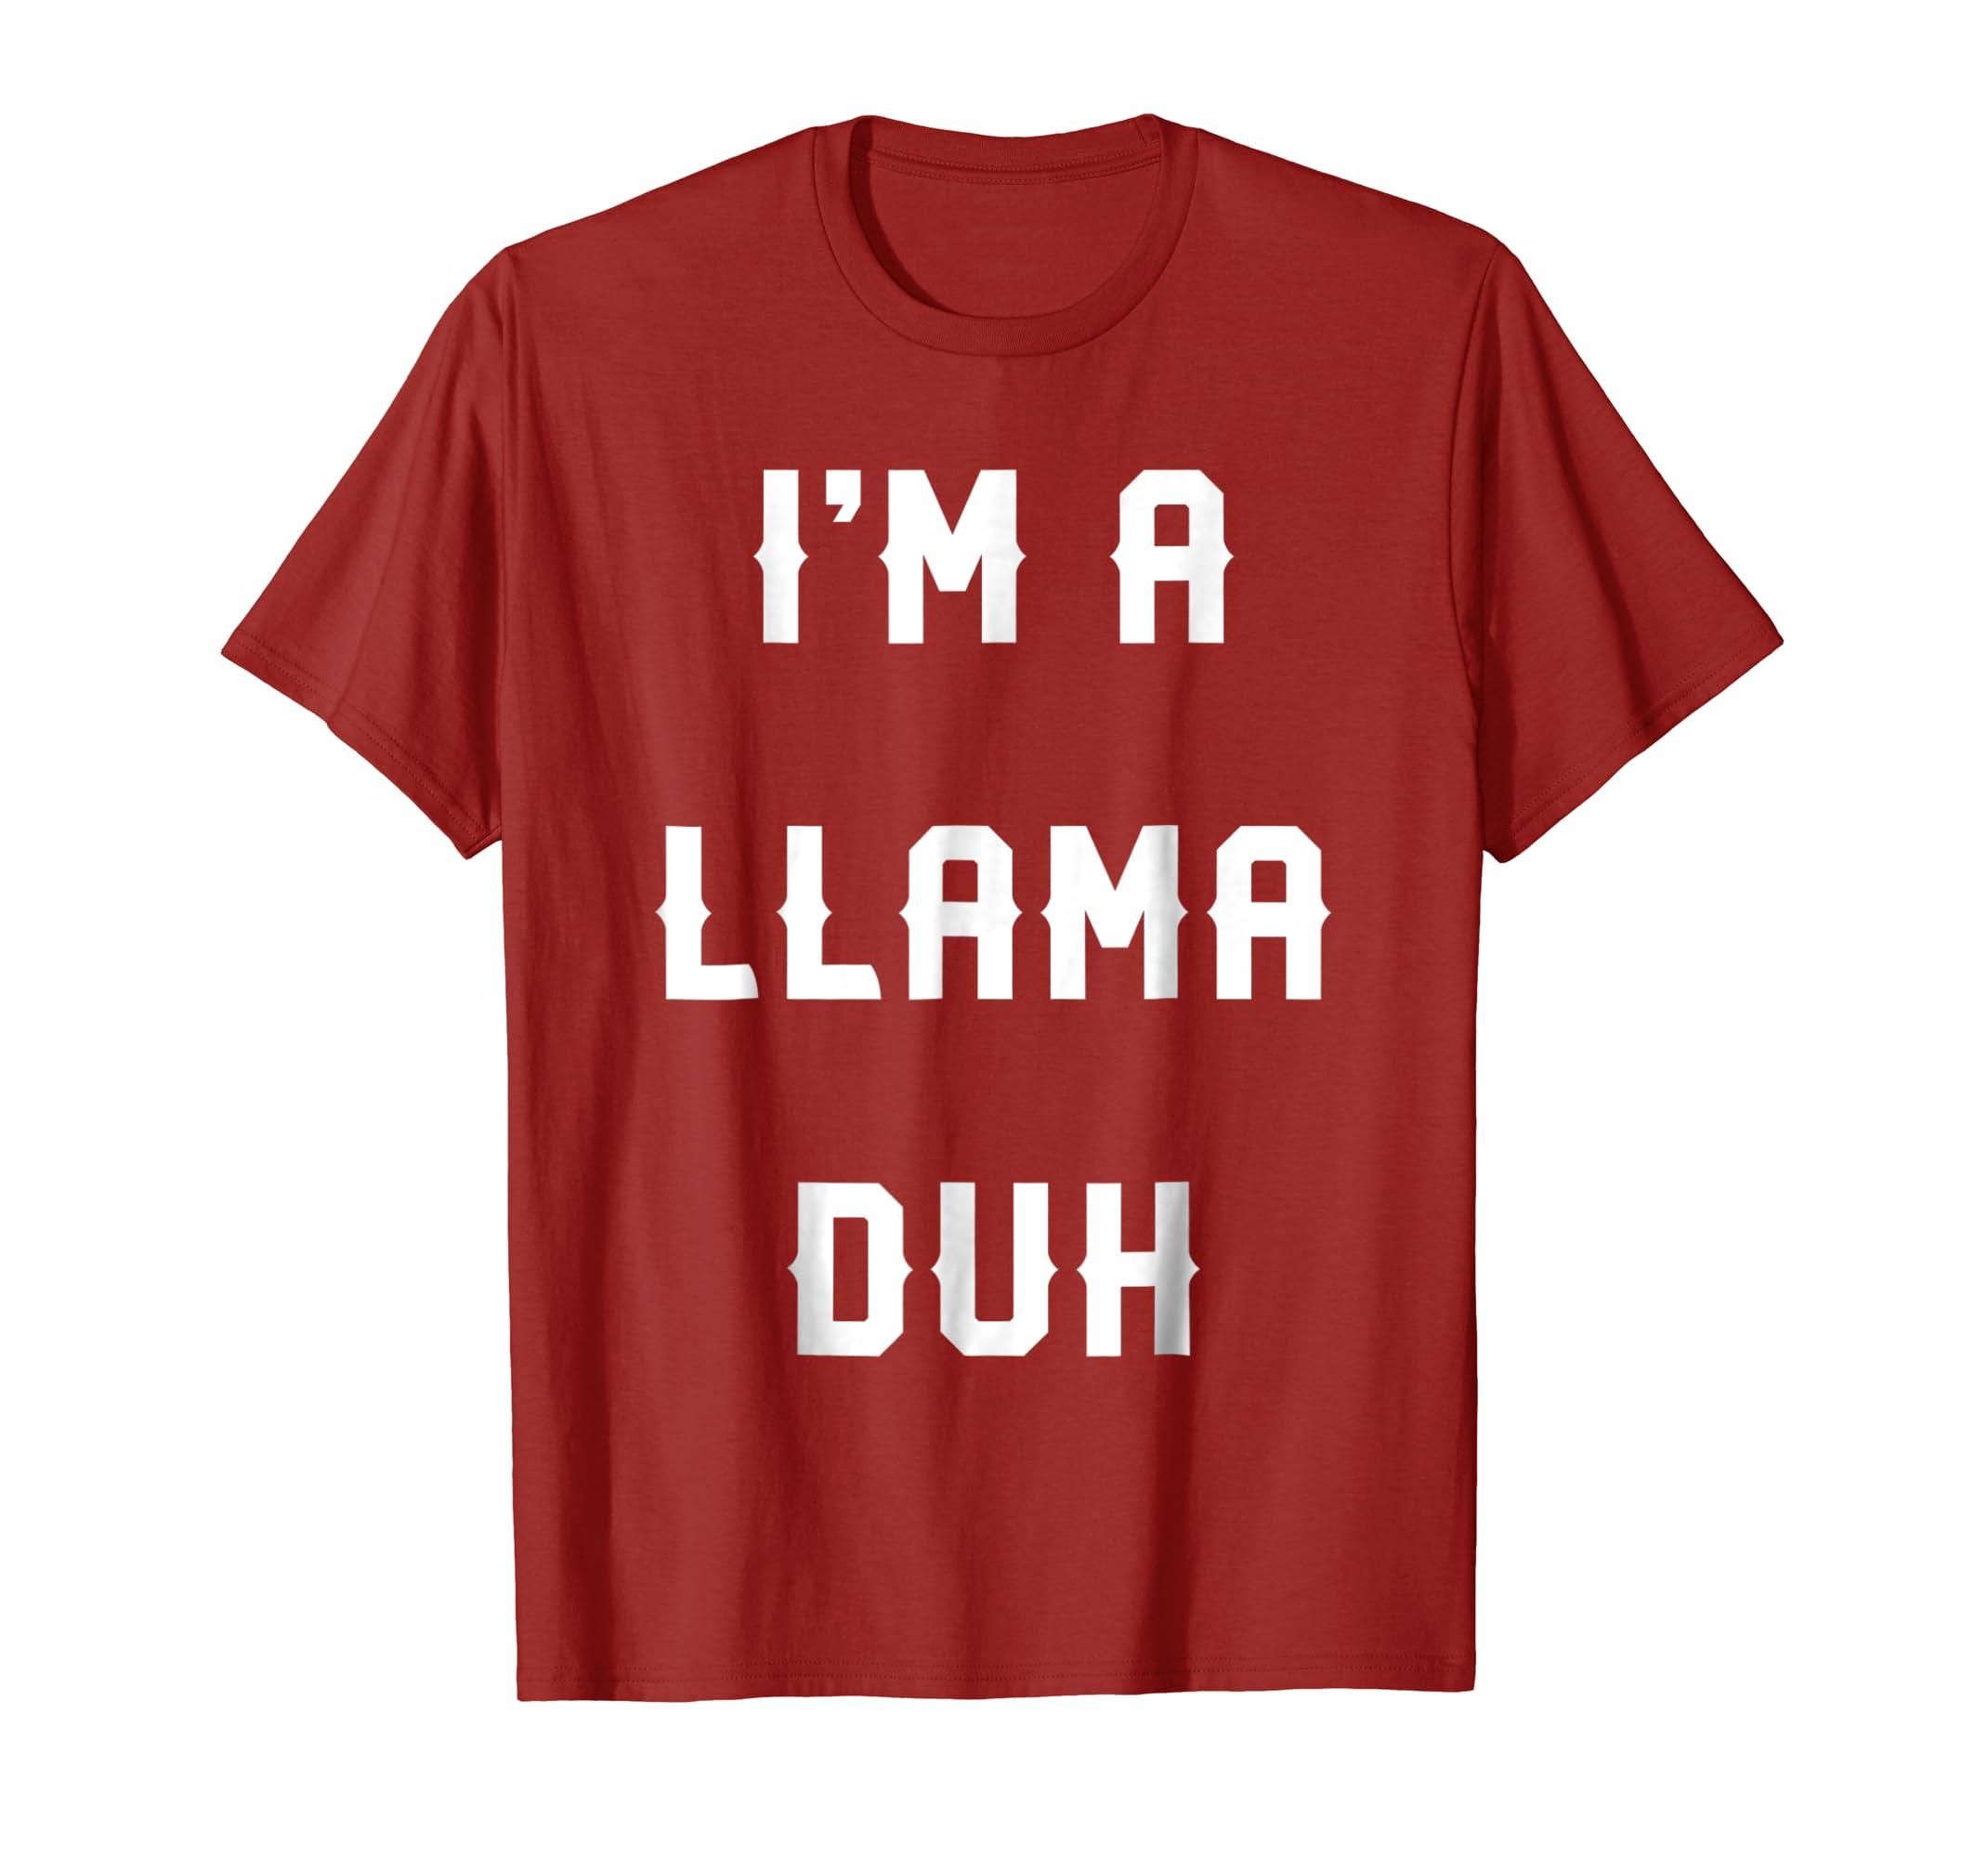 Halloween Easy Llama Costume Shirts, I'm A Llama Duh-Teechatpro